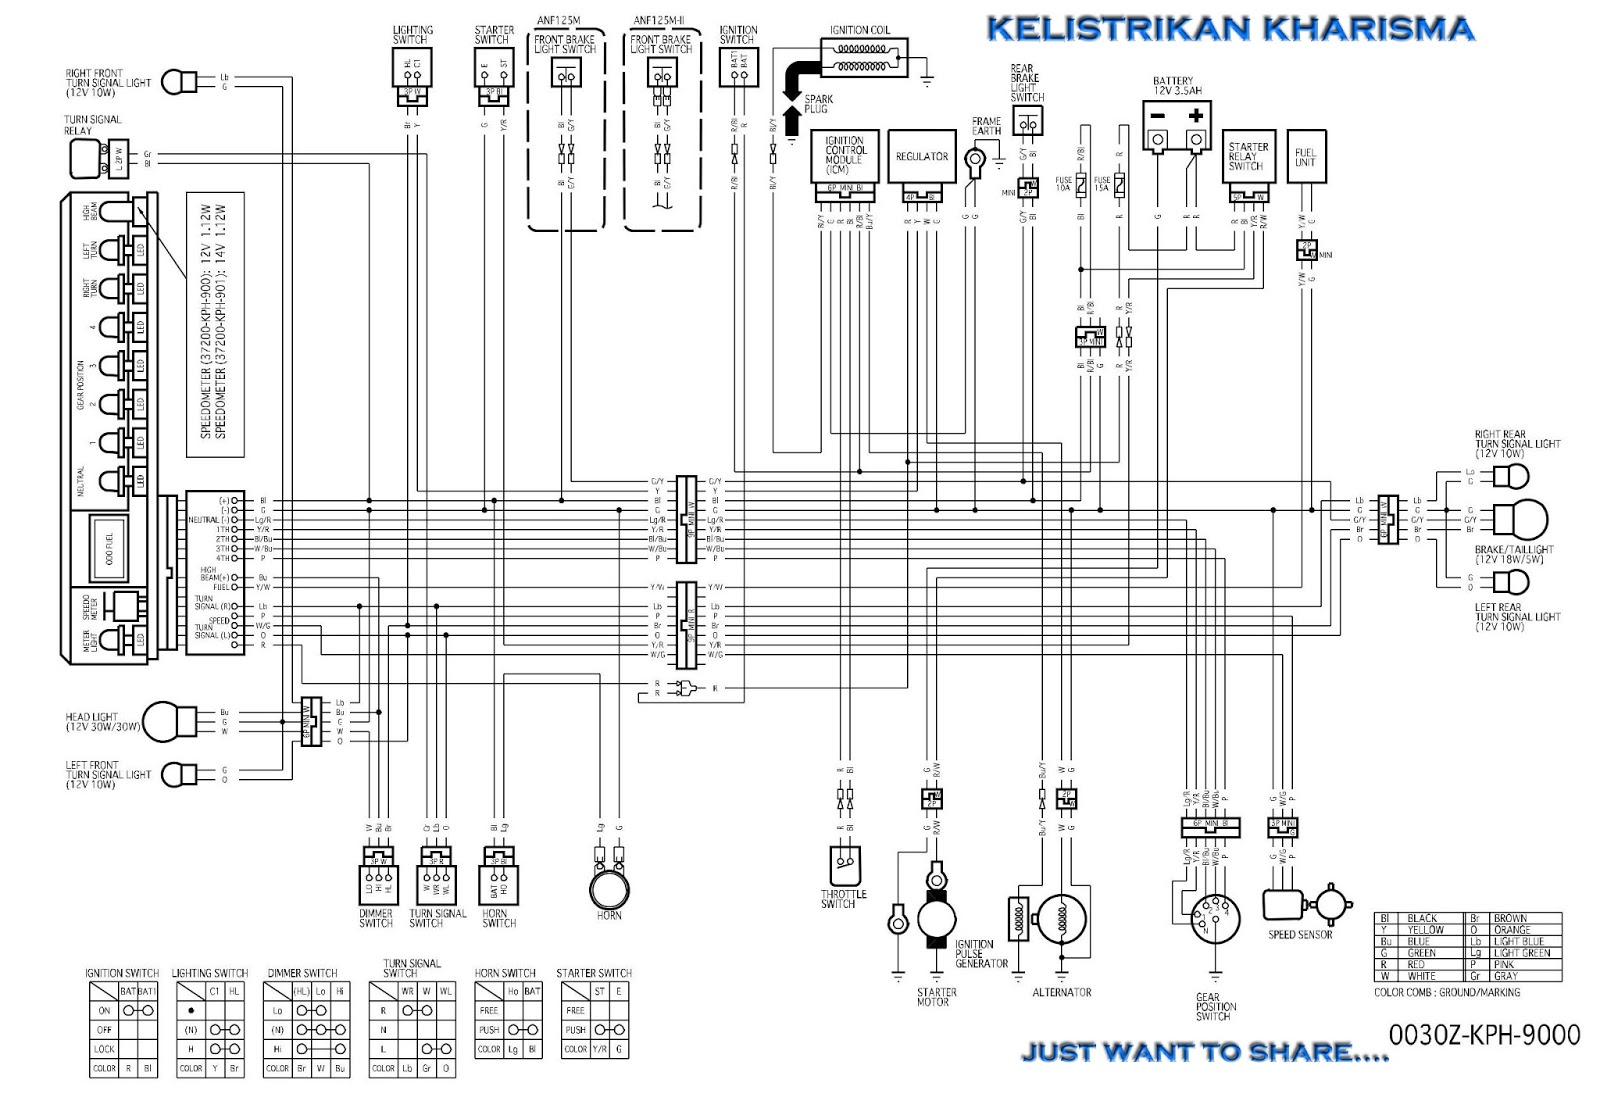 Diagram Wiring Diagram Kelistrikan Nmax Hd Version